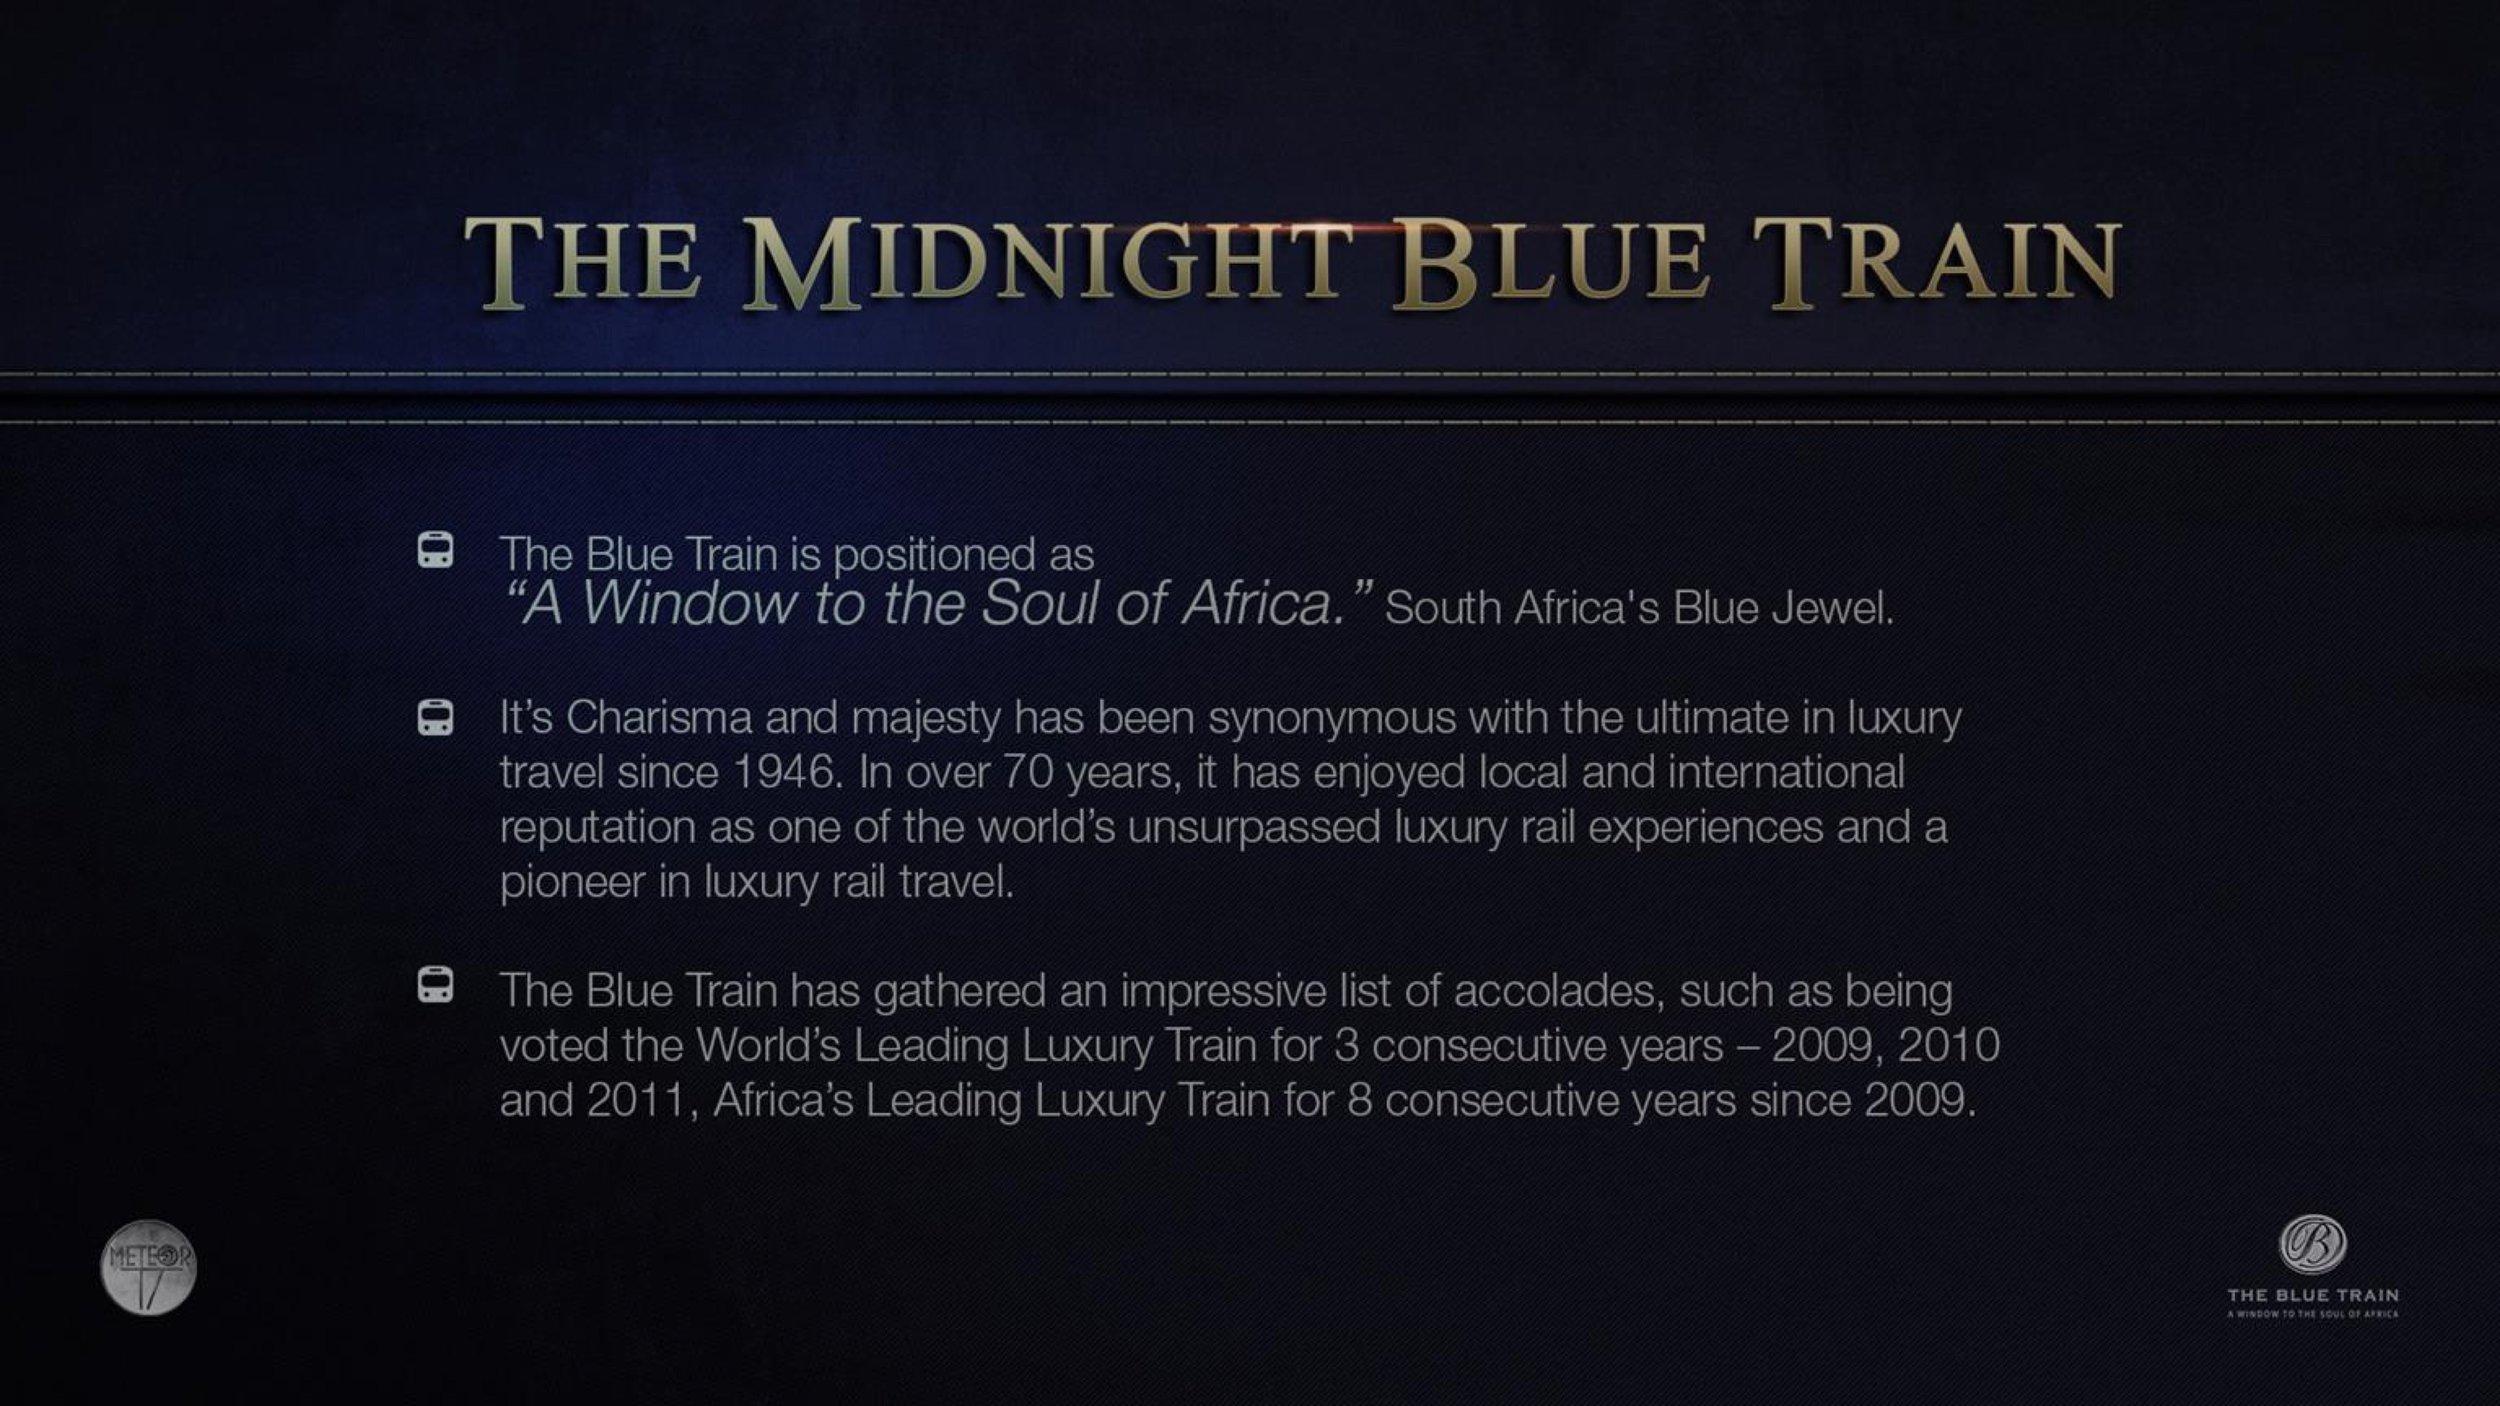 Midnight Blue Train *Transnet M17 updated deck 3 6.jpeg